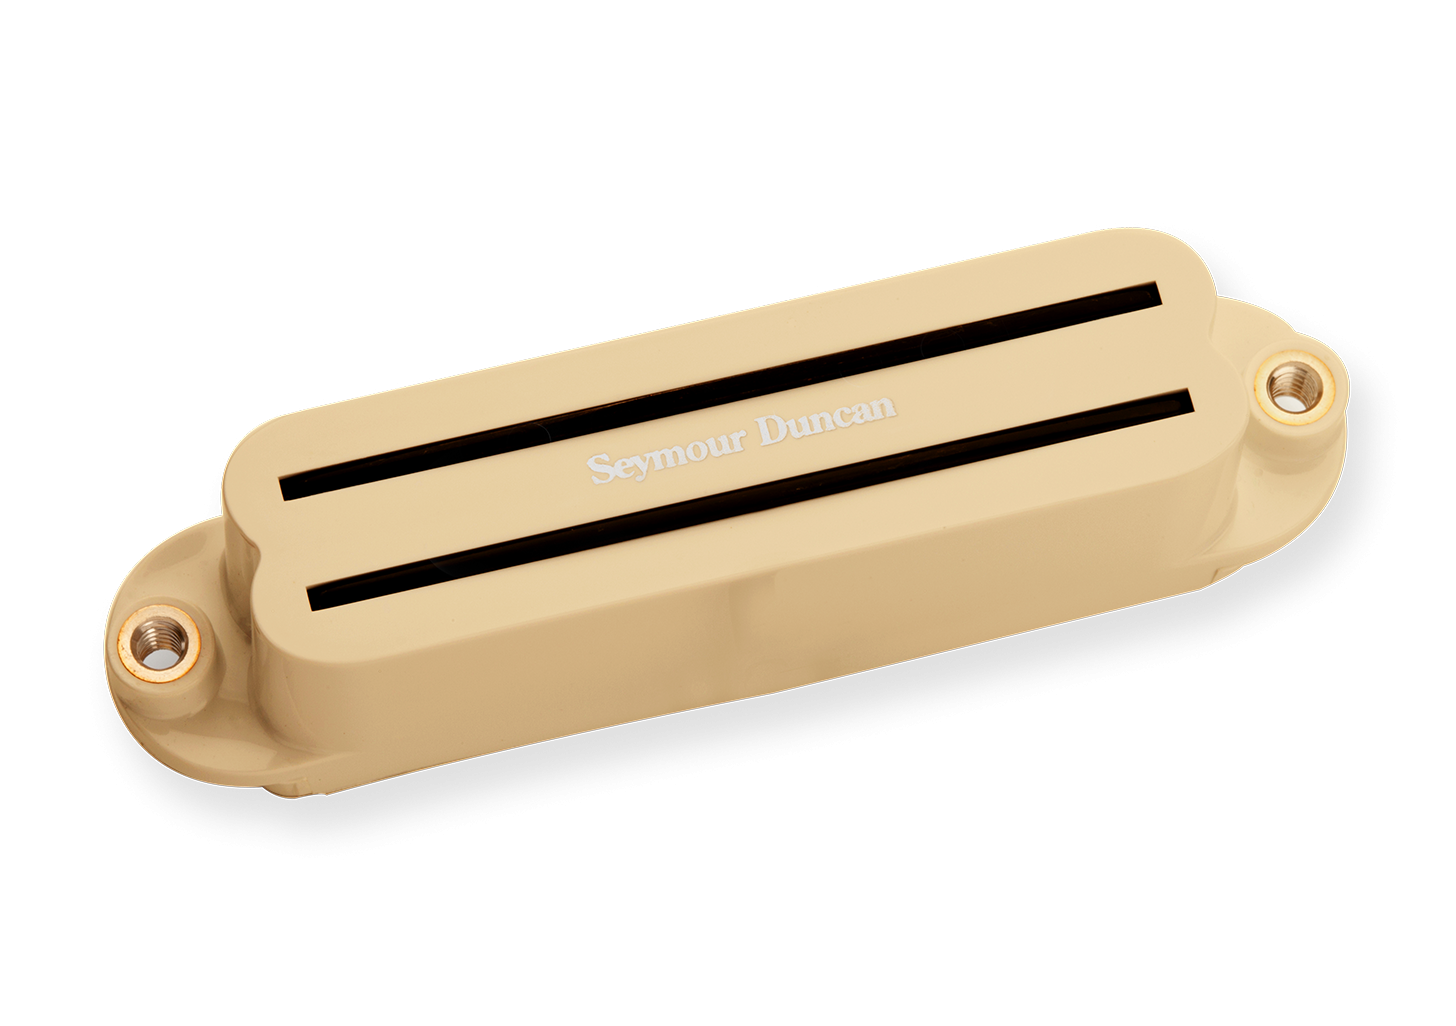 Seymour Duncan Hot Rails Strat SHR-1B - Bridge Cream